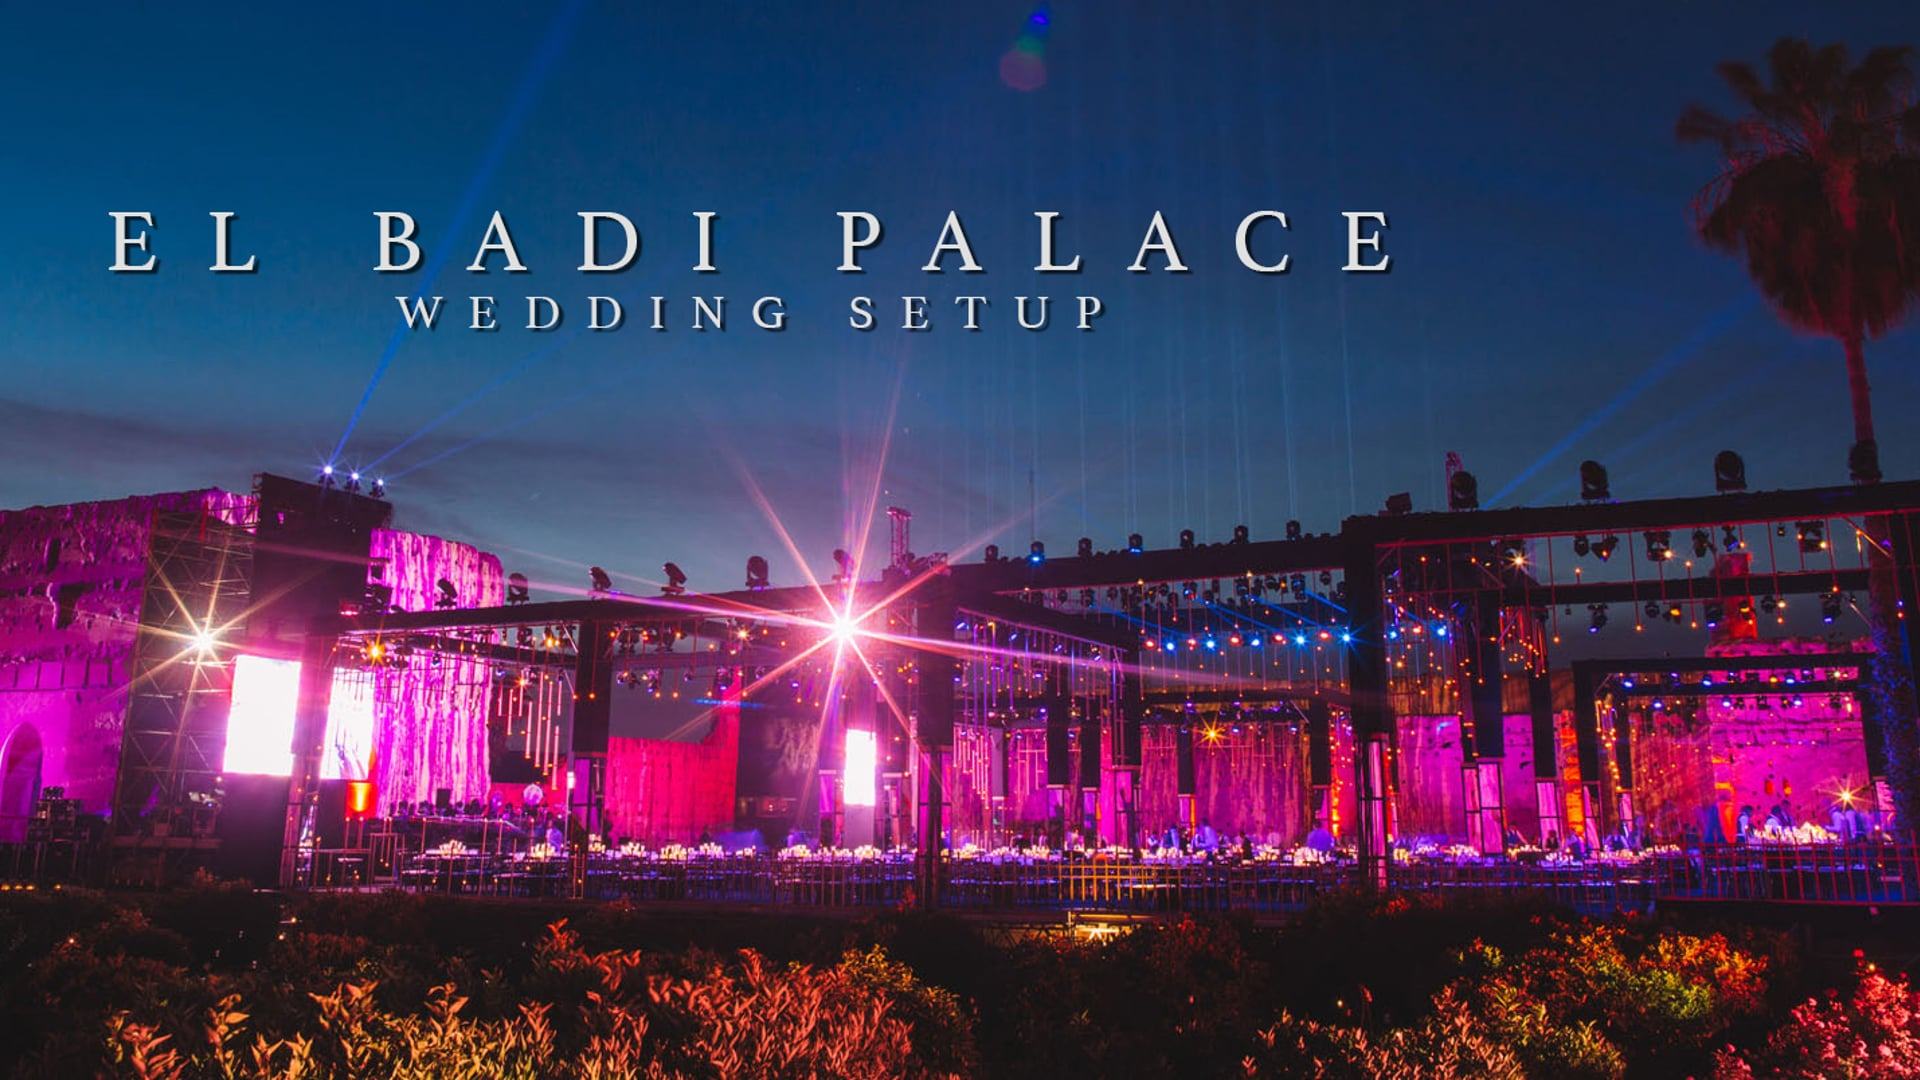 El Badi Palace / Marrakesh // Wedding Setup